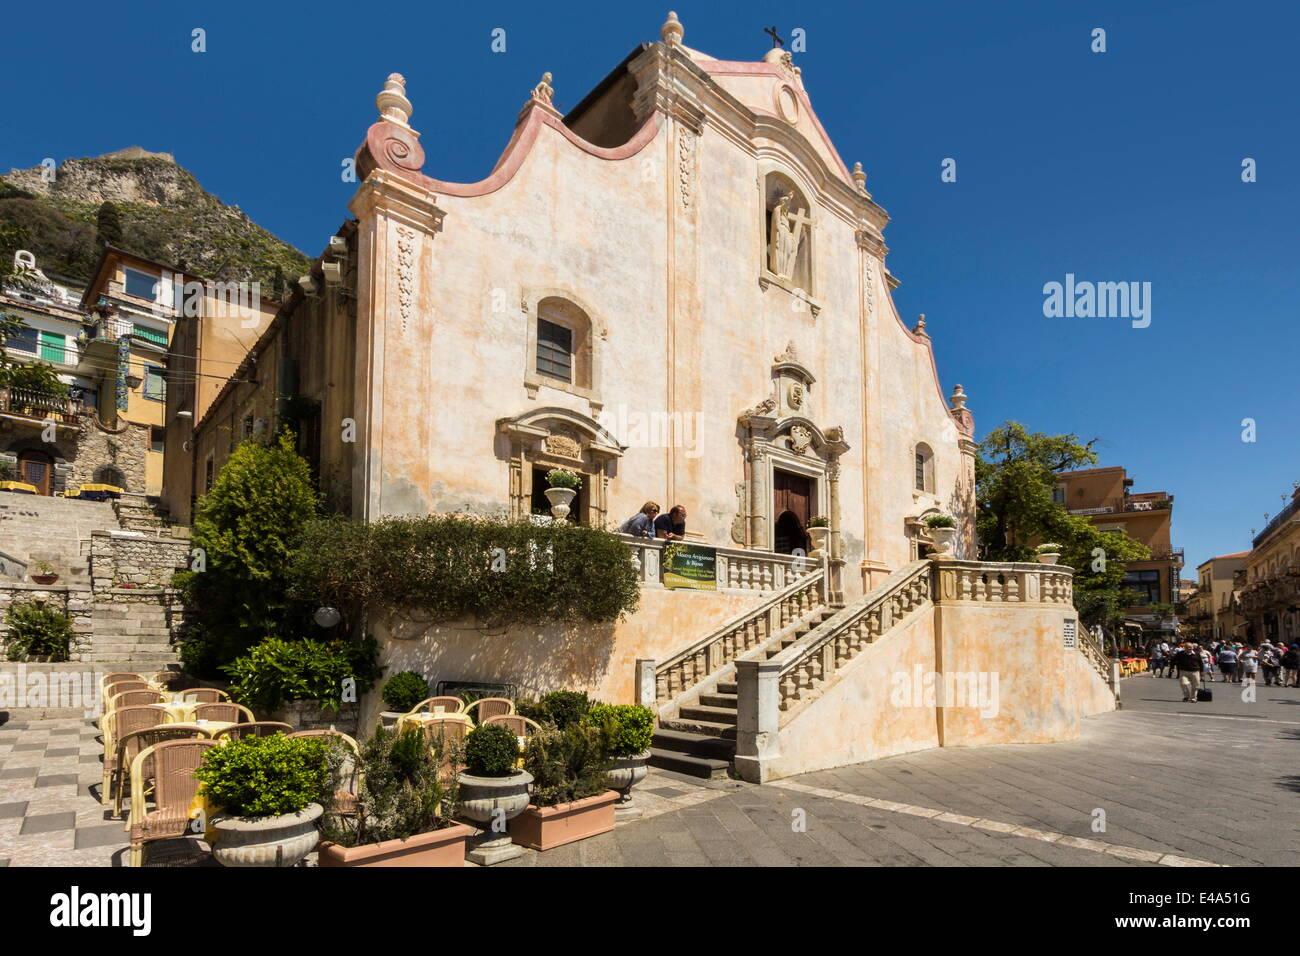 San Giuseppe Church and Piazza 9 April on Corso Umberto, Taormina, Catania Province, Sicily, Italy - Stock Image